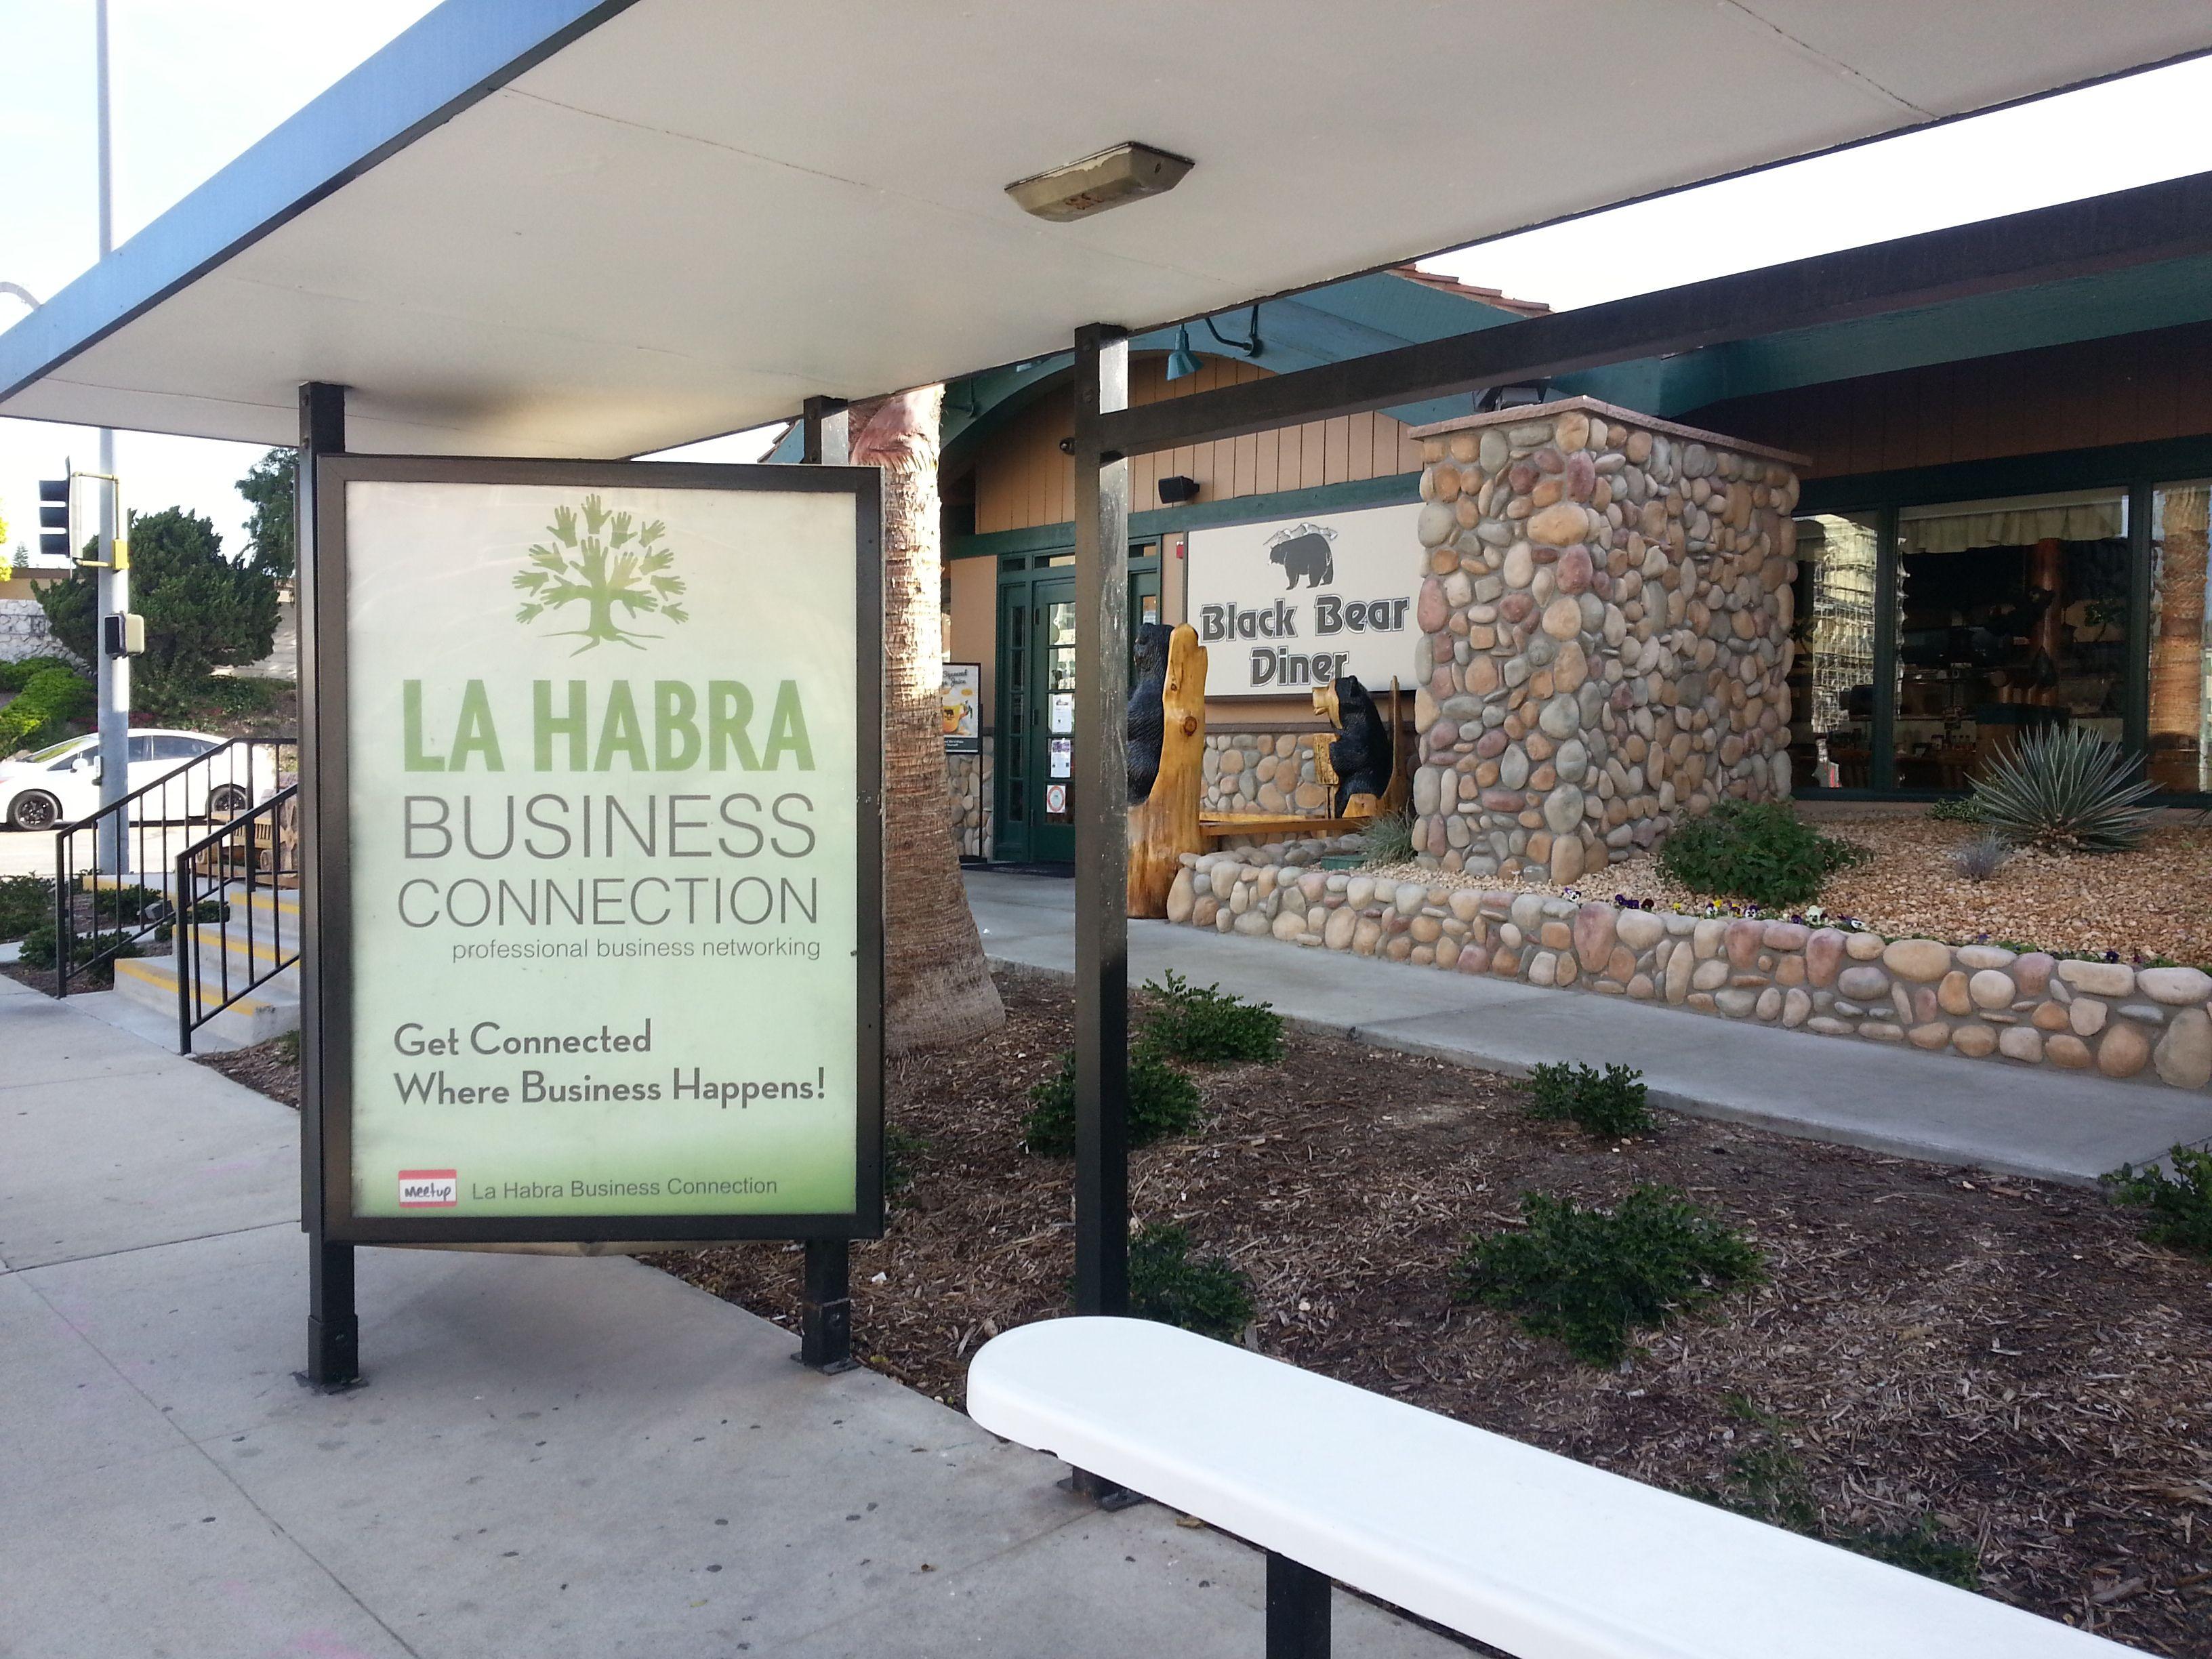 The La Habra Business Connection